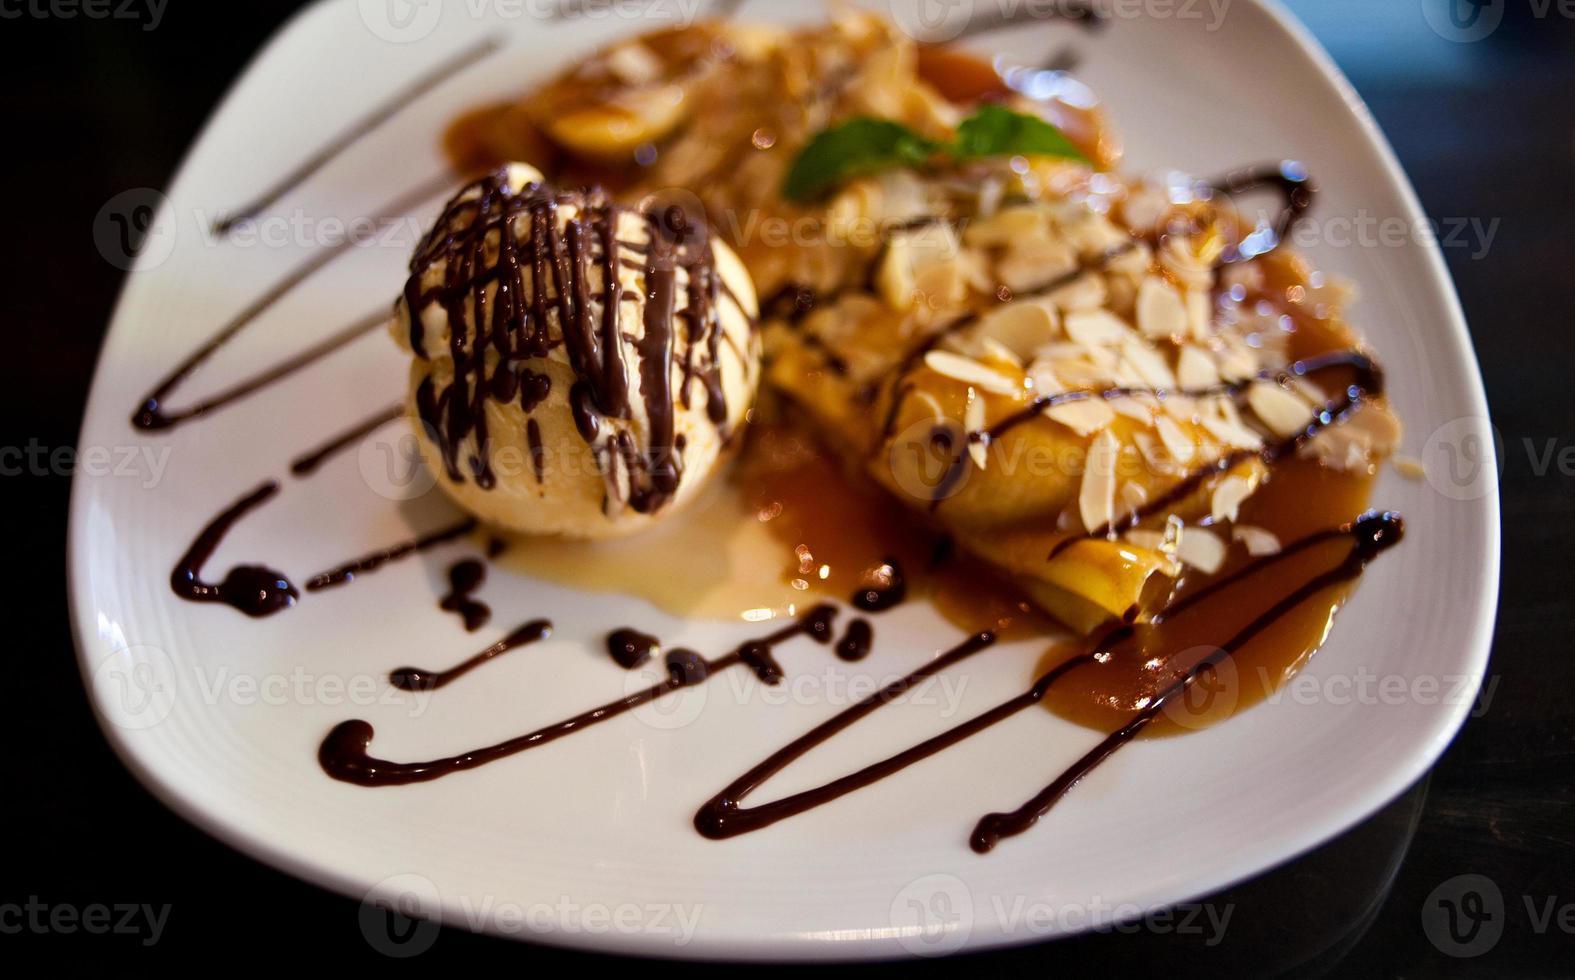 gelato e banana foto